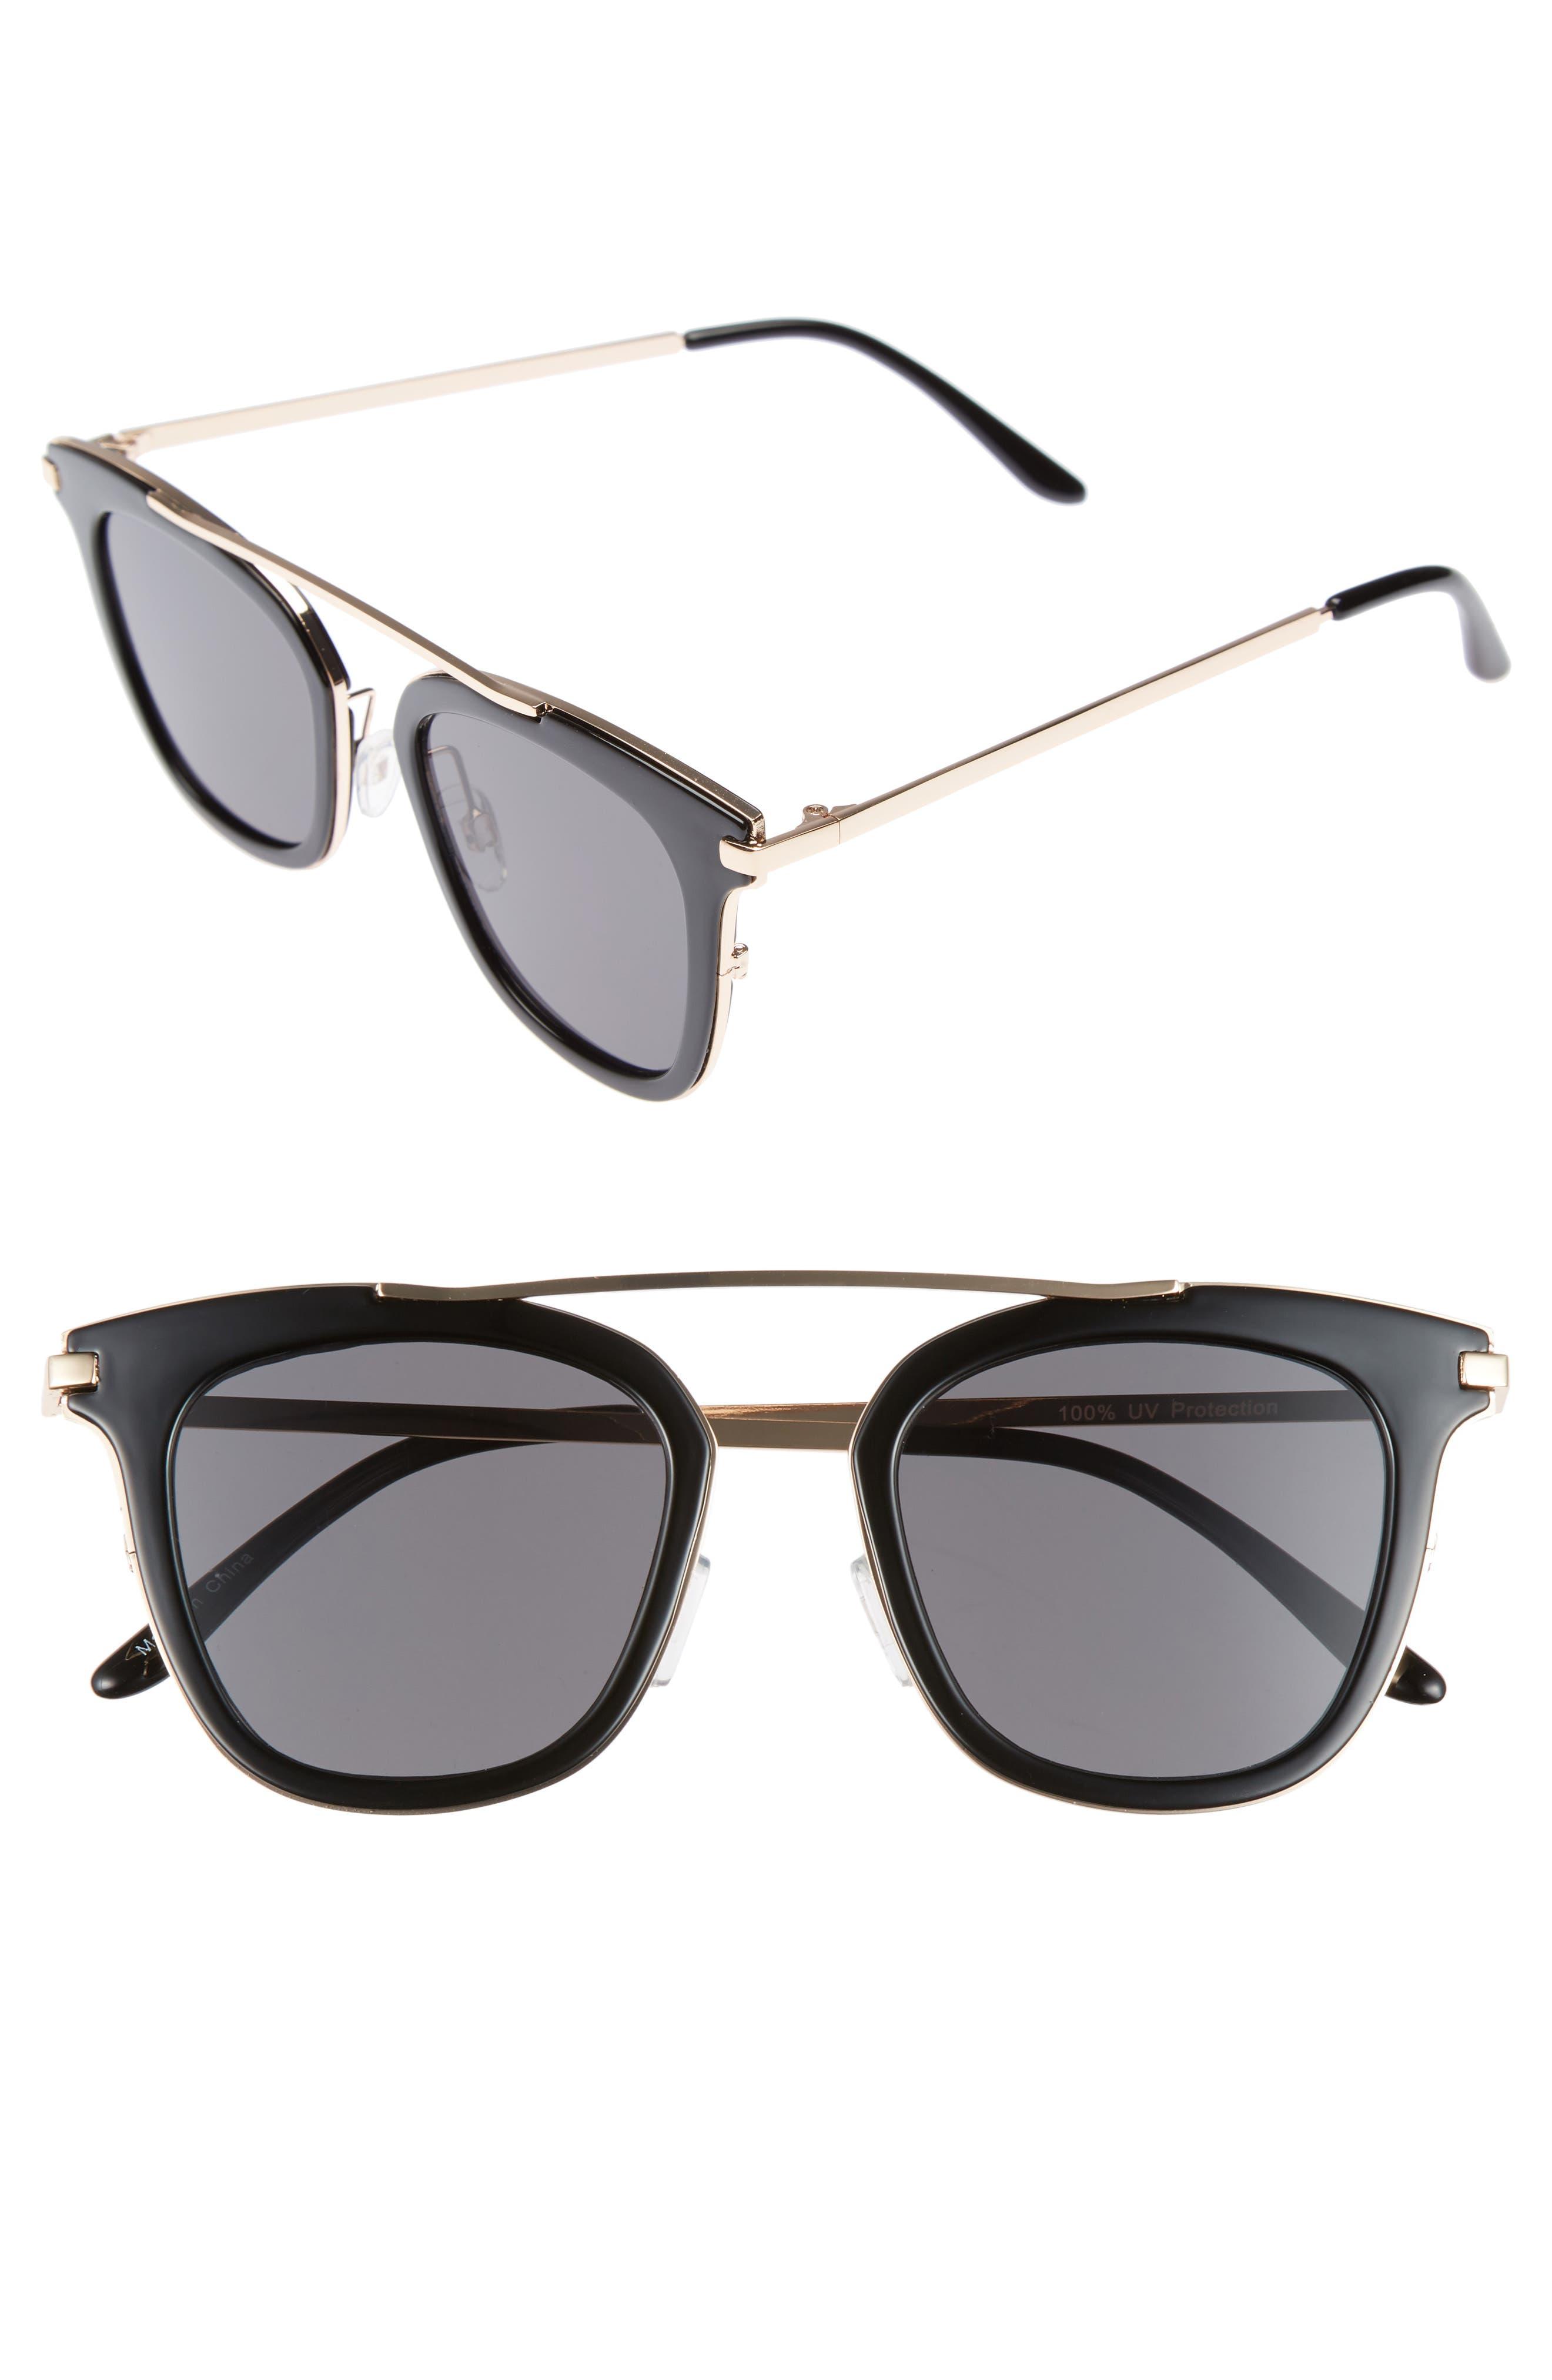 50mm Sunglasses,                         Main,                         color, Black